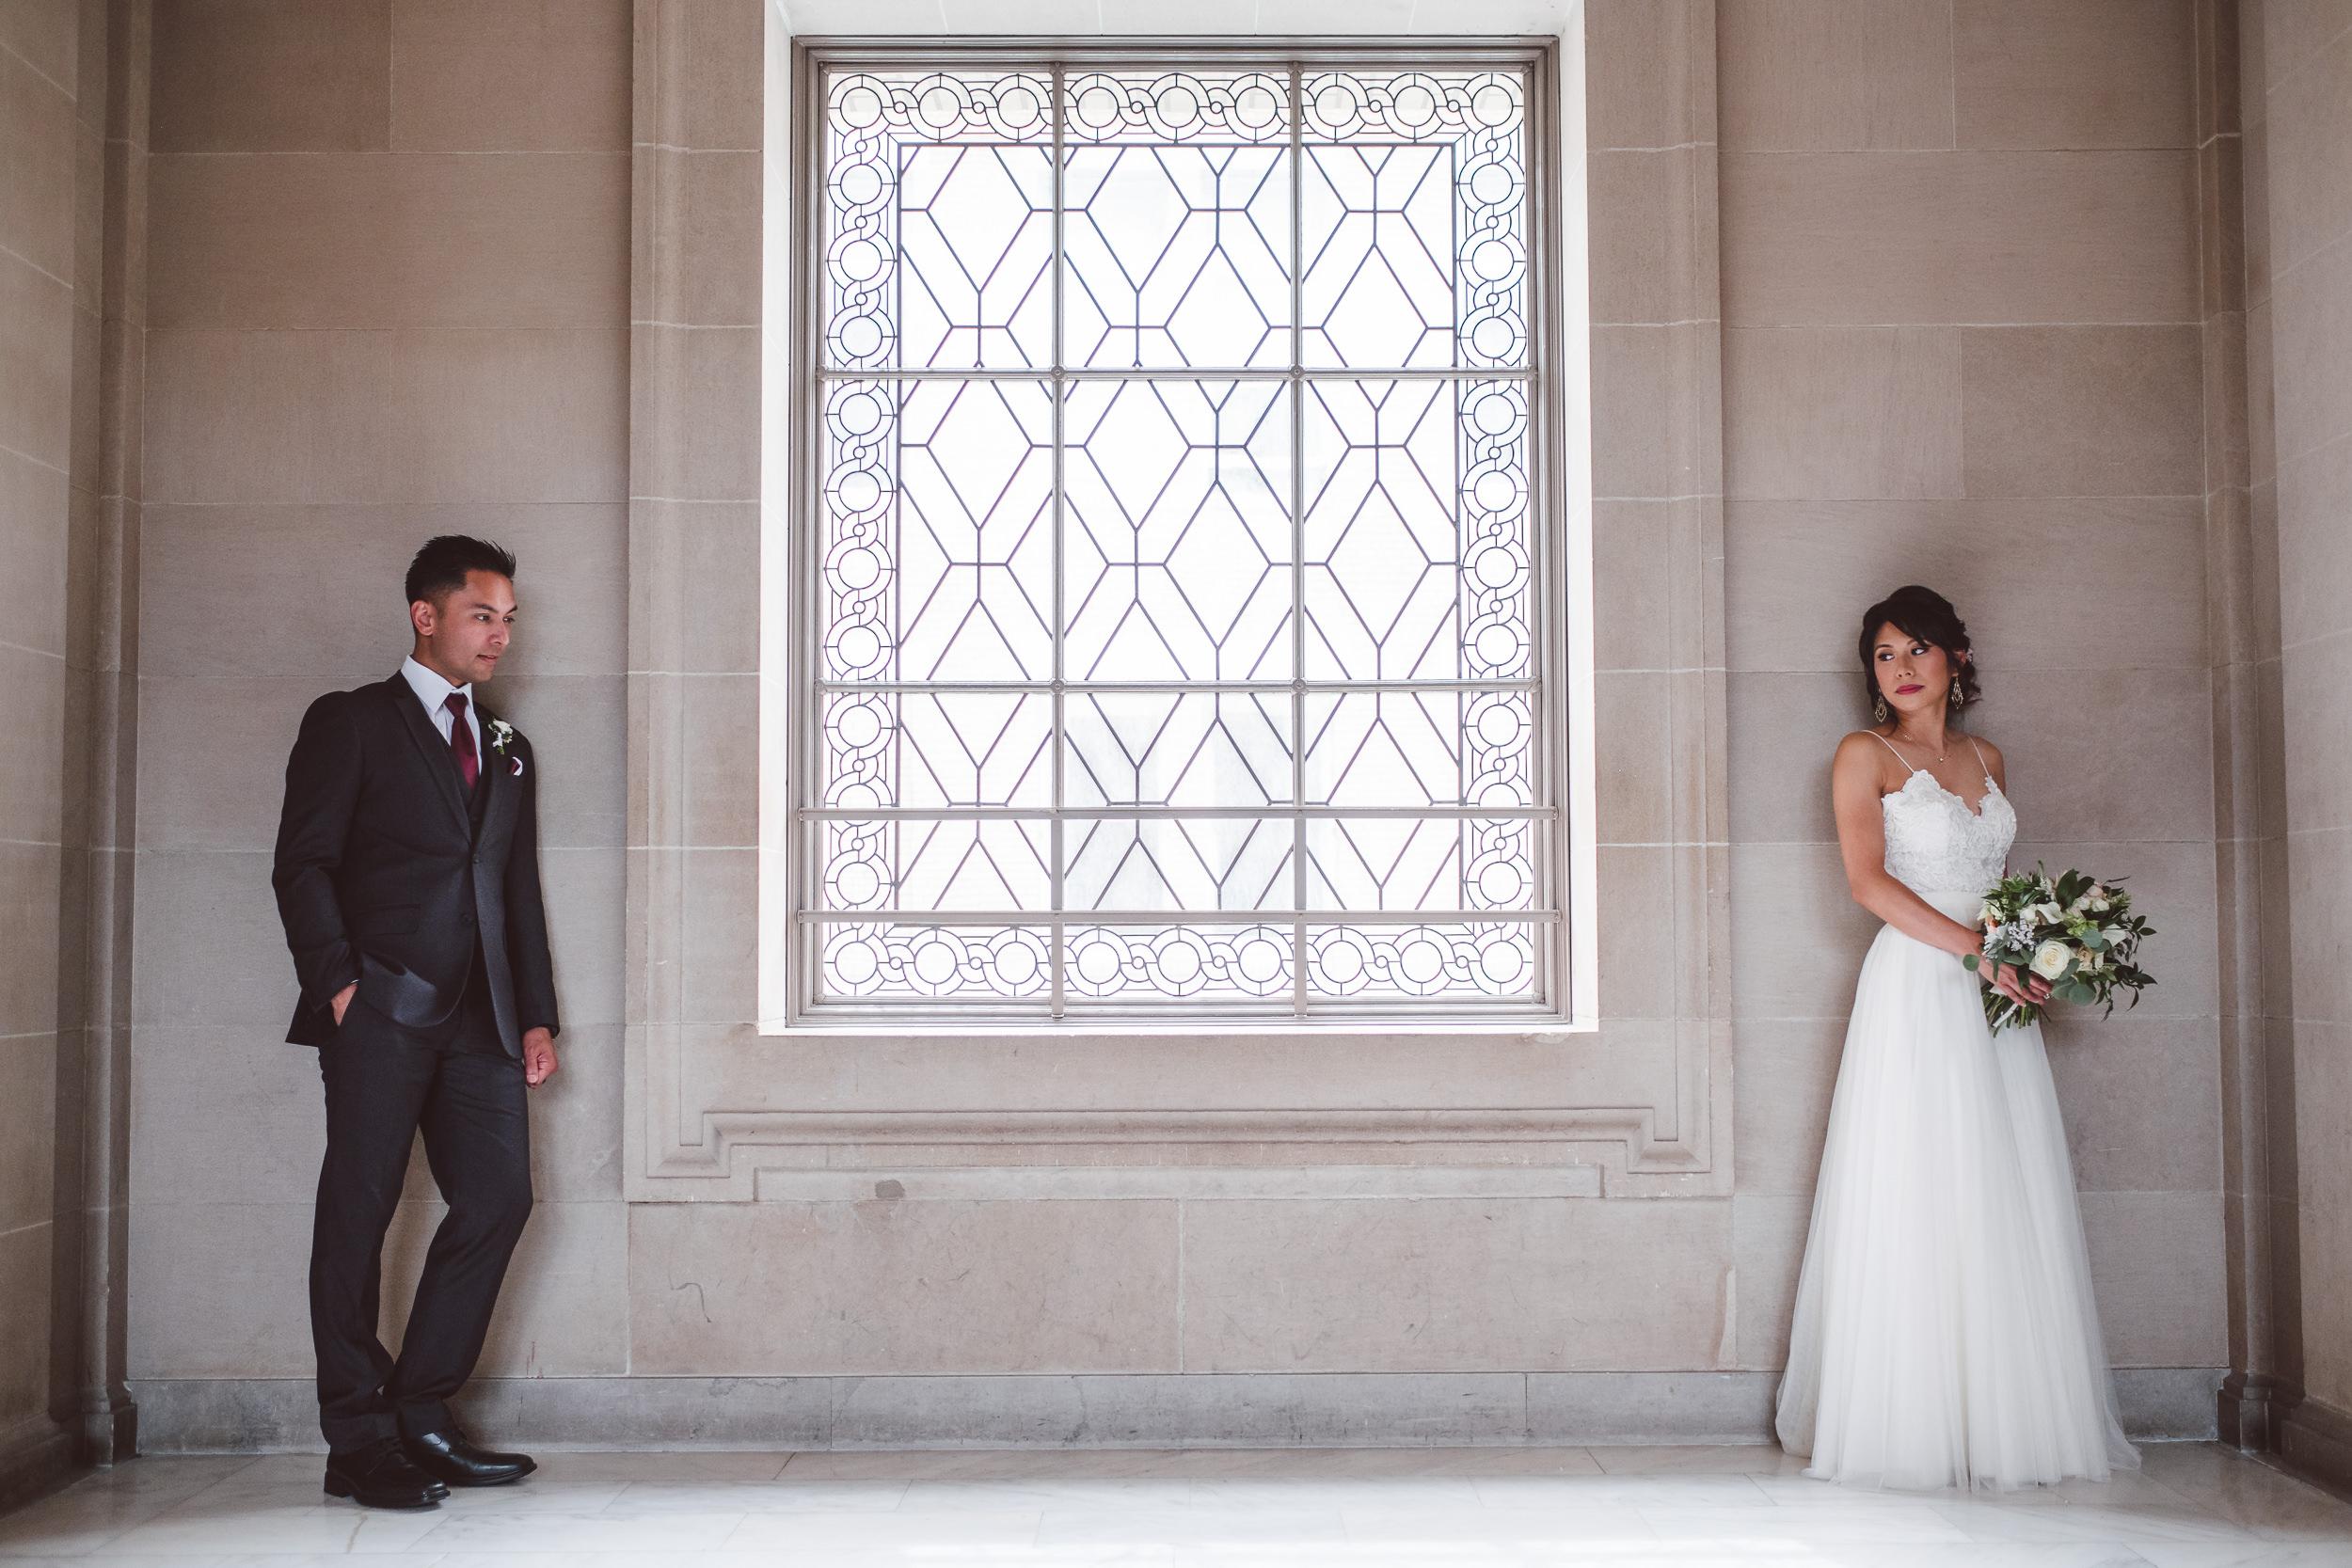 San-Francisco-City-Hall-Wedding-Photography-063.jpg